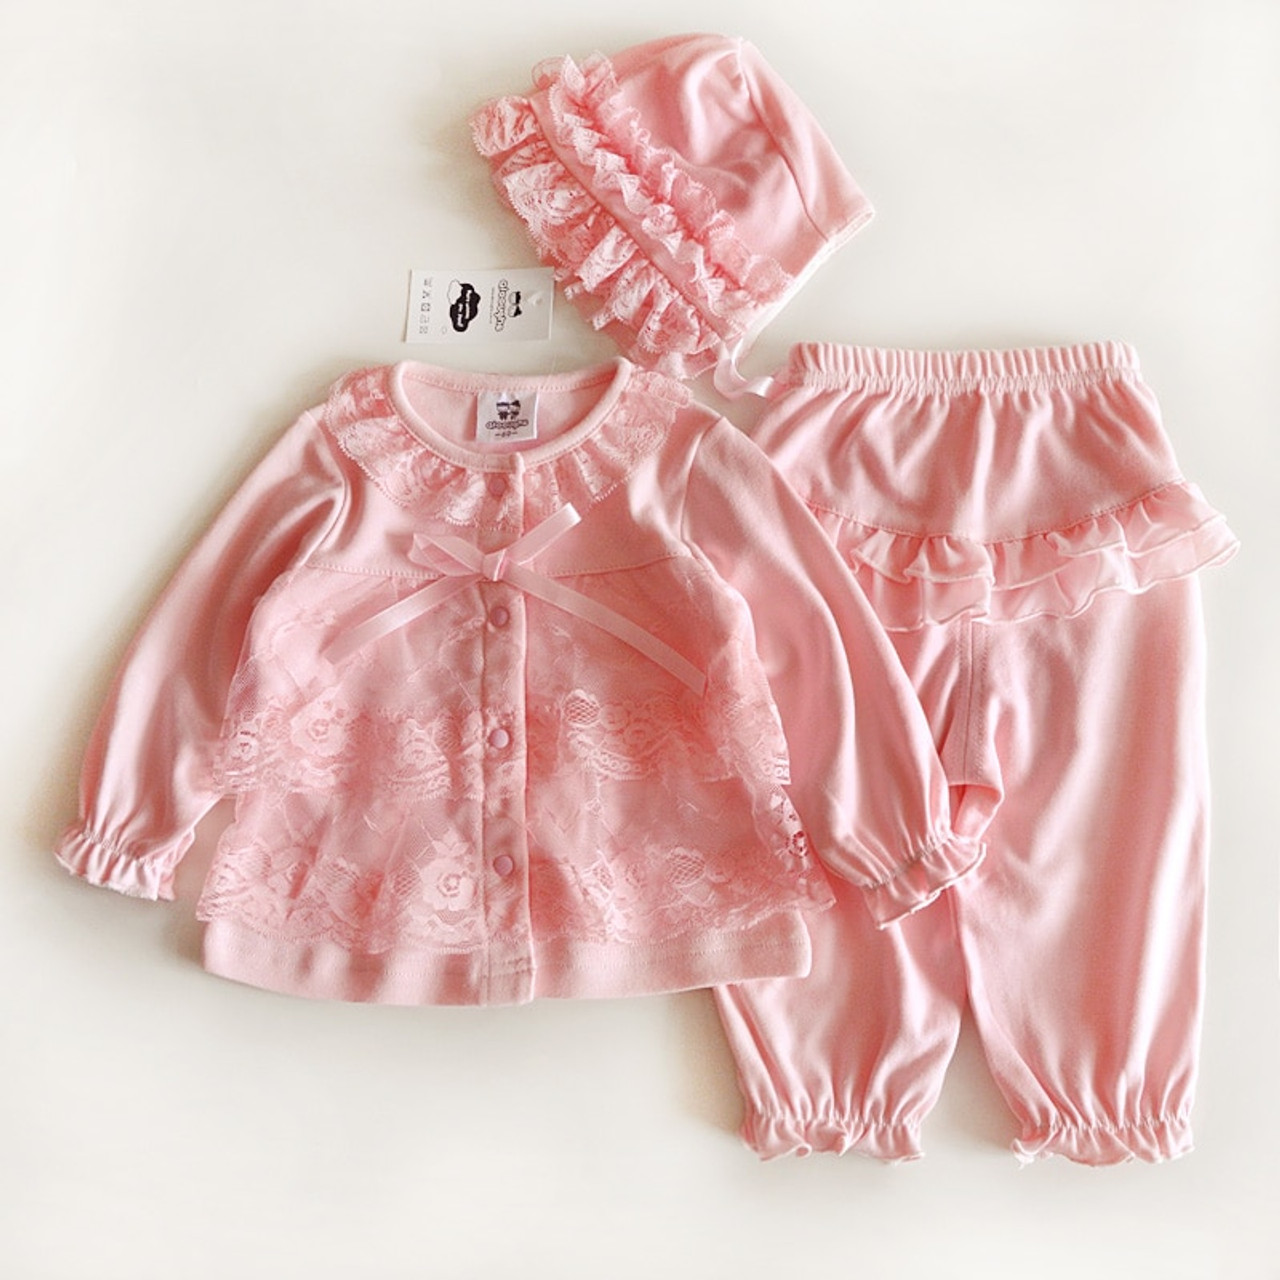 a49bdd593848 3 Pcs cute newborn baby girl clothes set 1st birthday 2017 new style ...